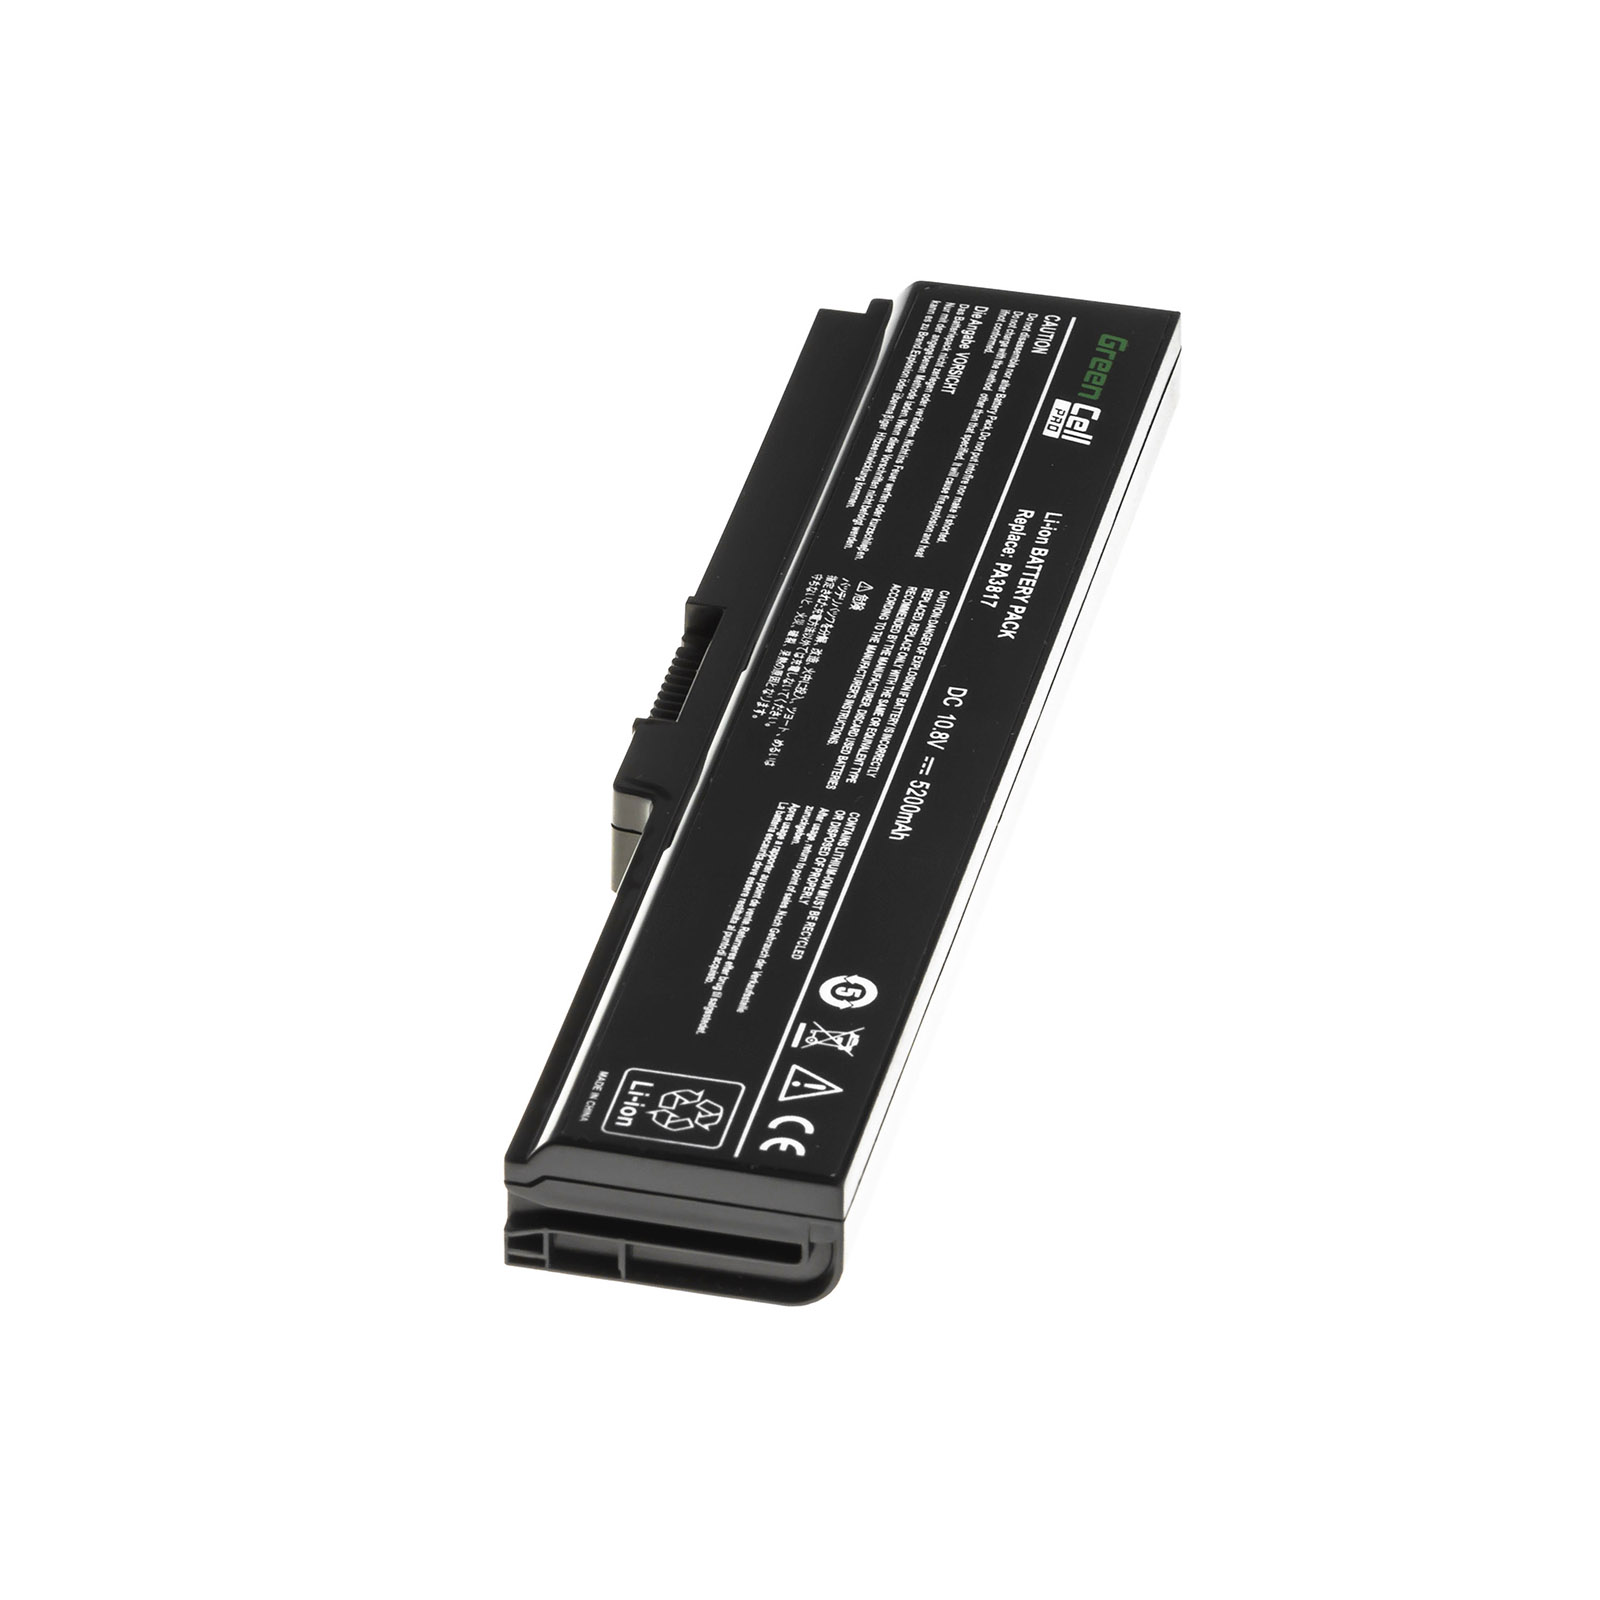 Bateria-para-Toshiba-DynaBook-Qosmio-T550-T4BB-T550-T4BW-Ordenador-5200mAh